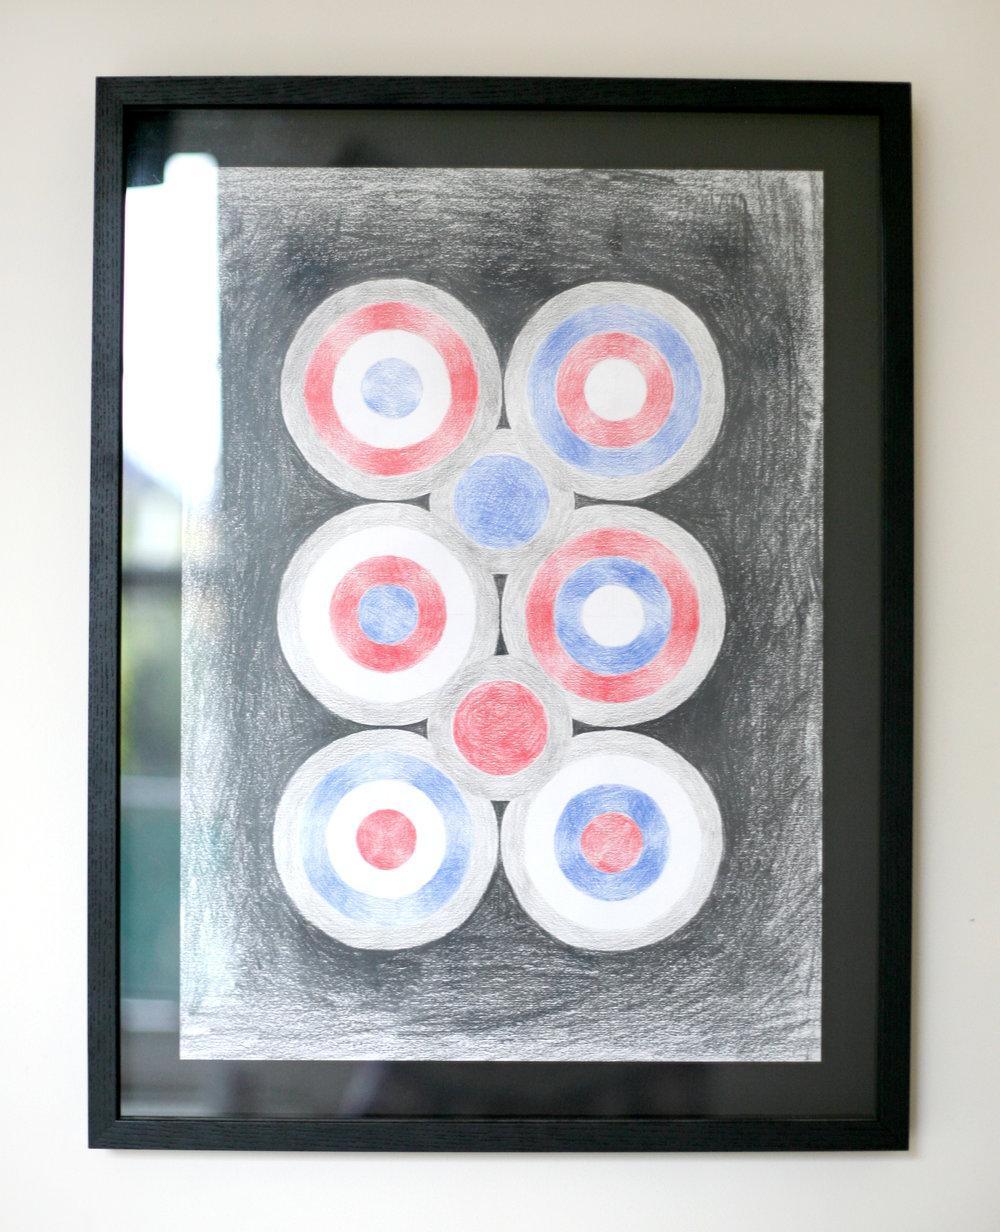 Roundel variations